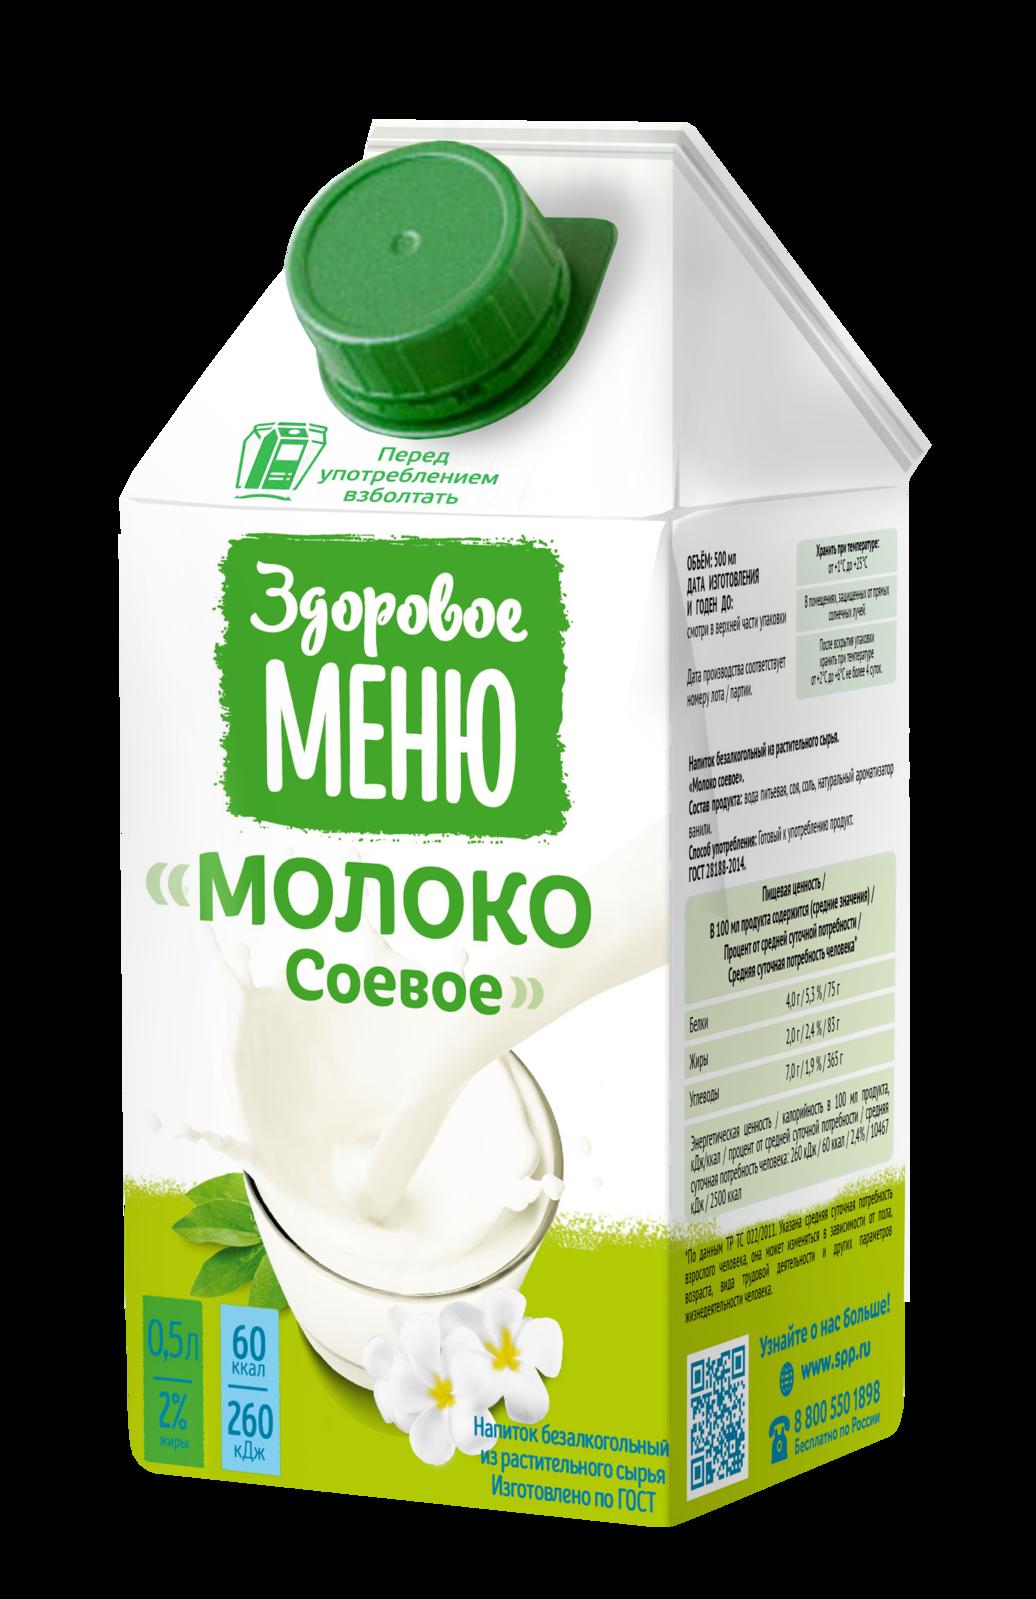 de39a51d61d3 0,5 литра молоко здоровое меню соевое.png «